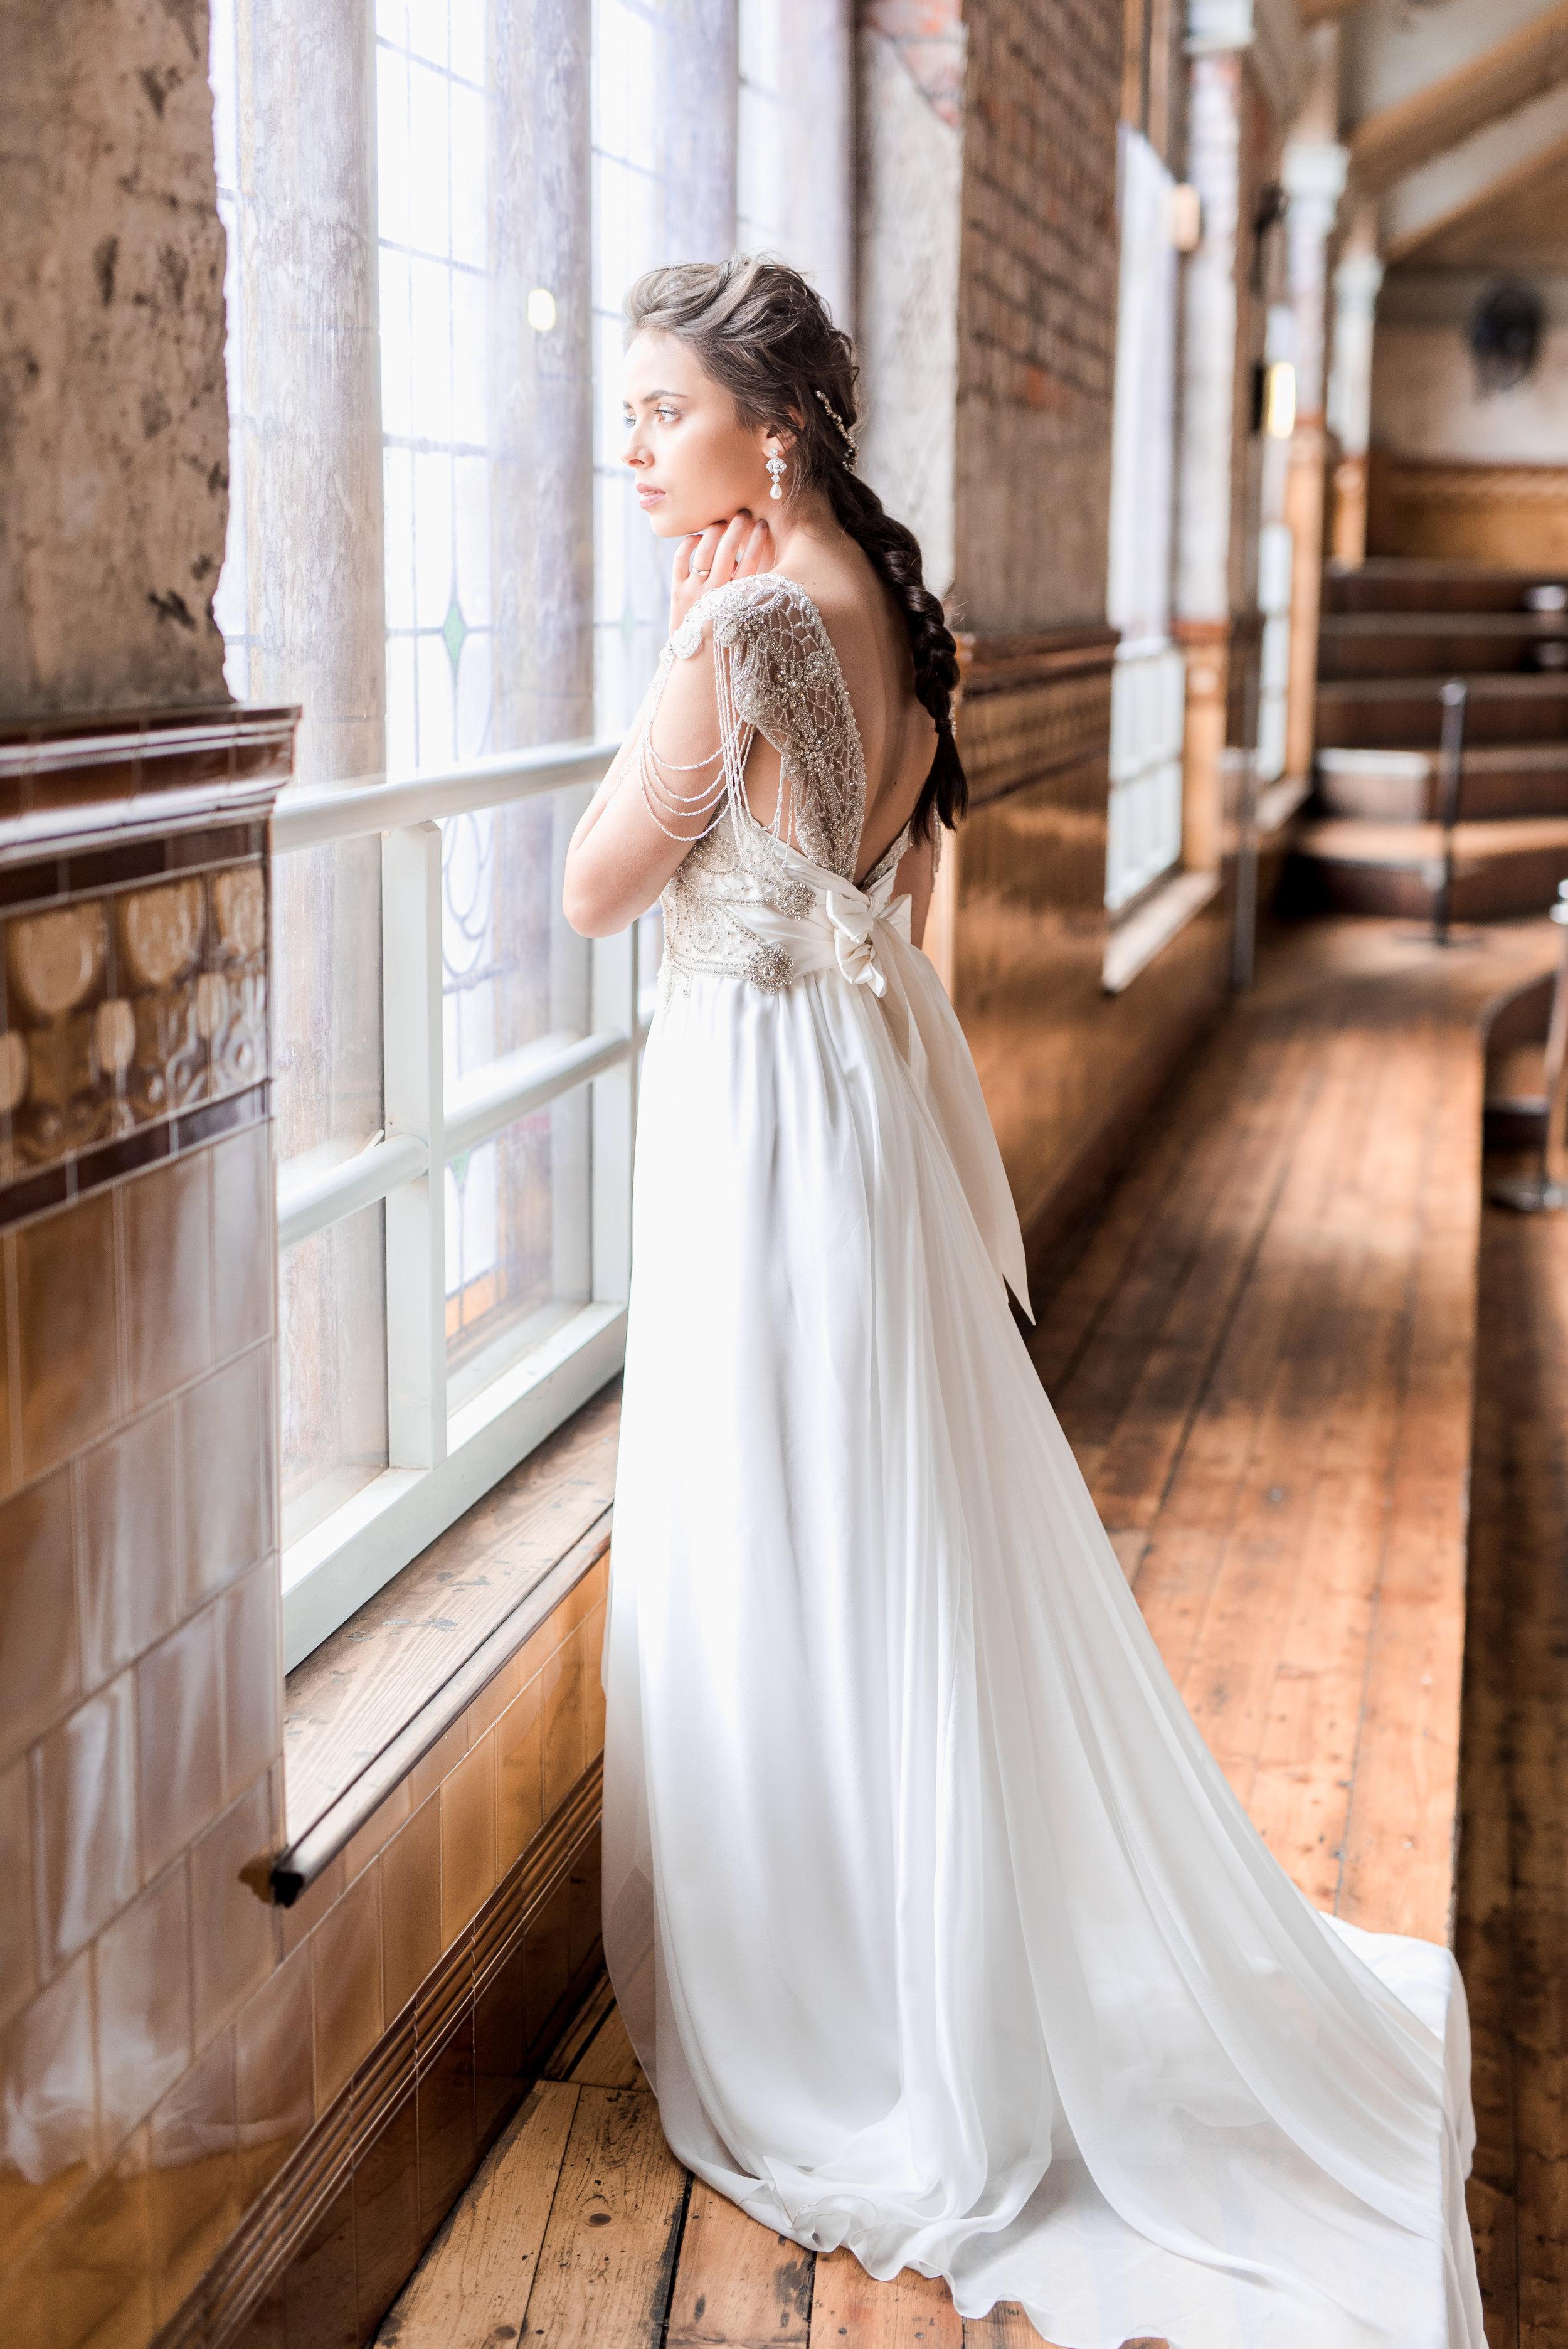 Anna Campbell Bridal   Grace Dress   Eternal Heart Collection   Vintage Inspired Beaded Wedding Dress